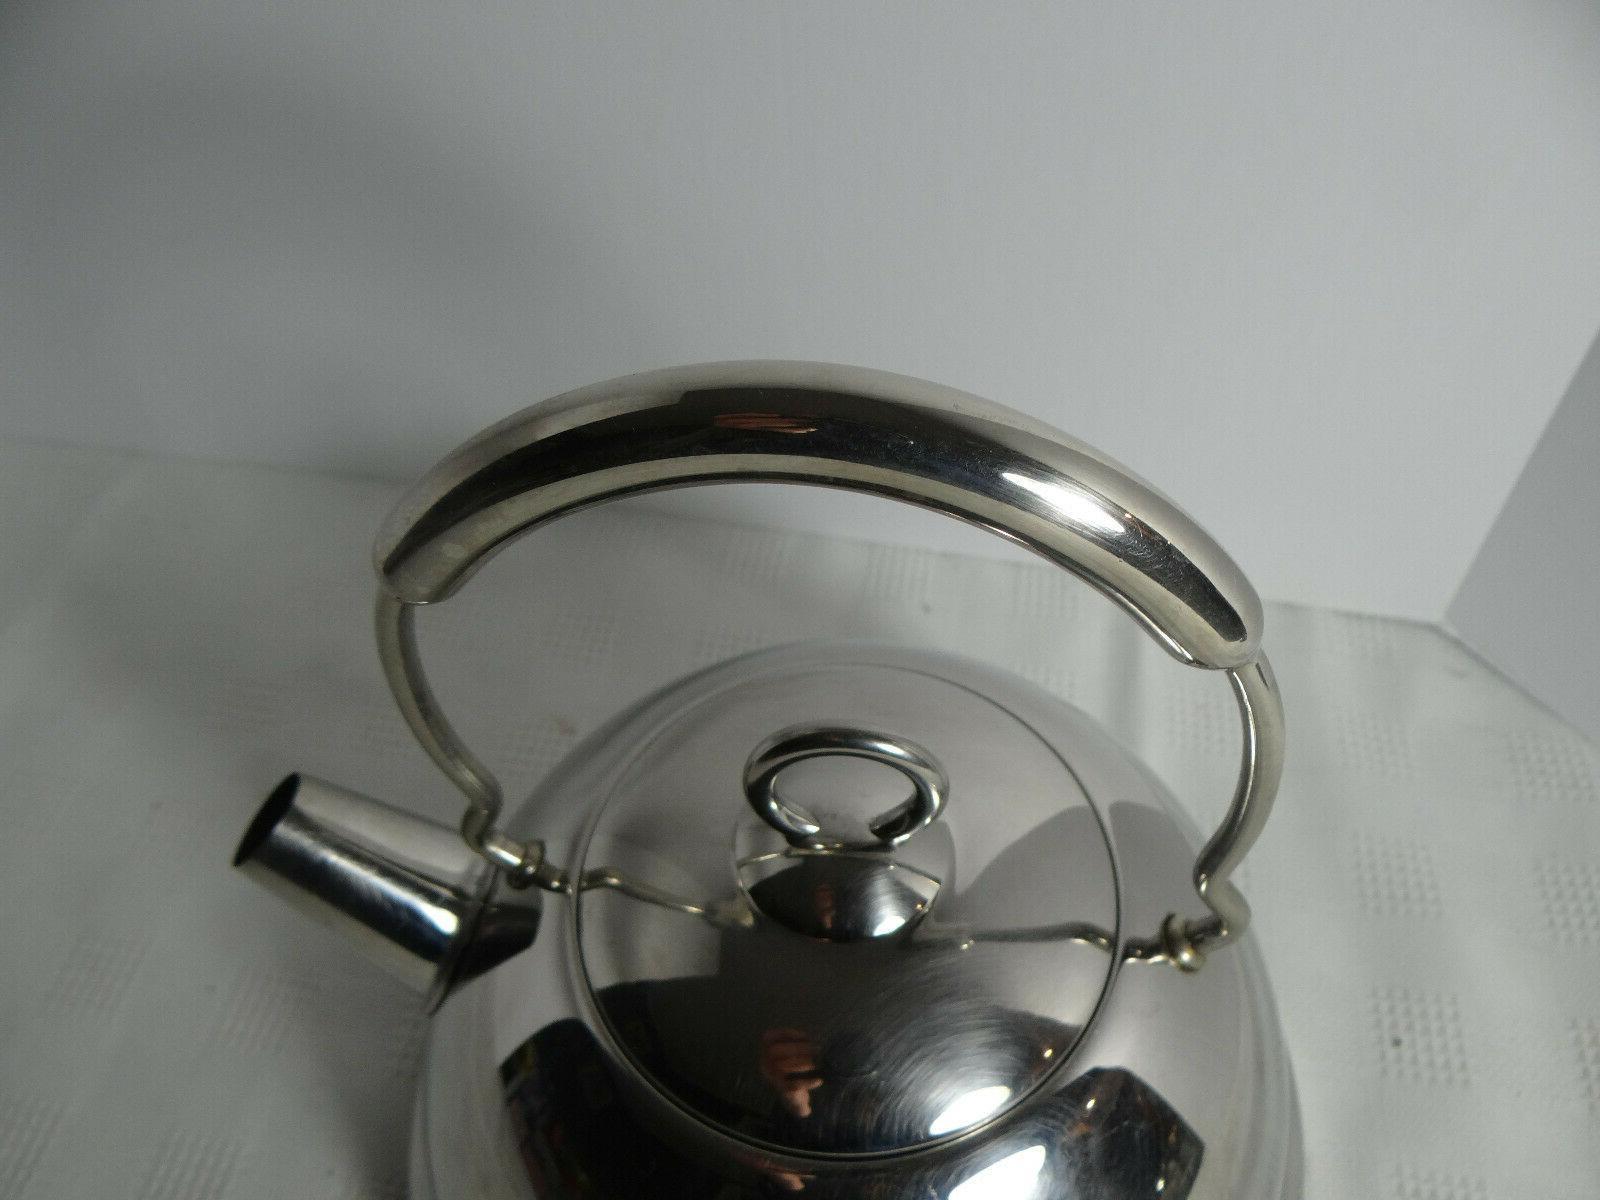 Vintage Tea Kettle in Korea